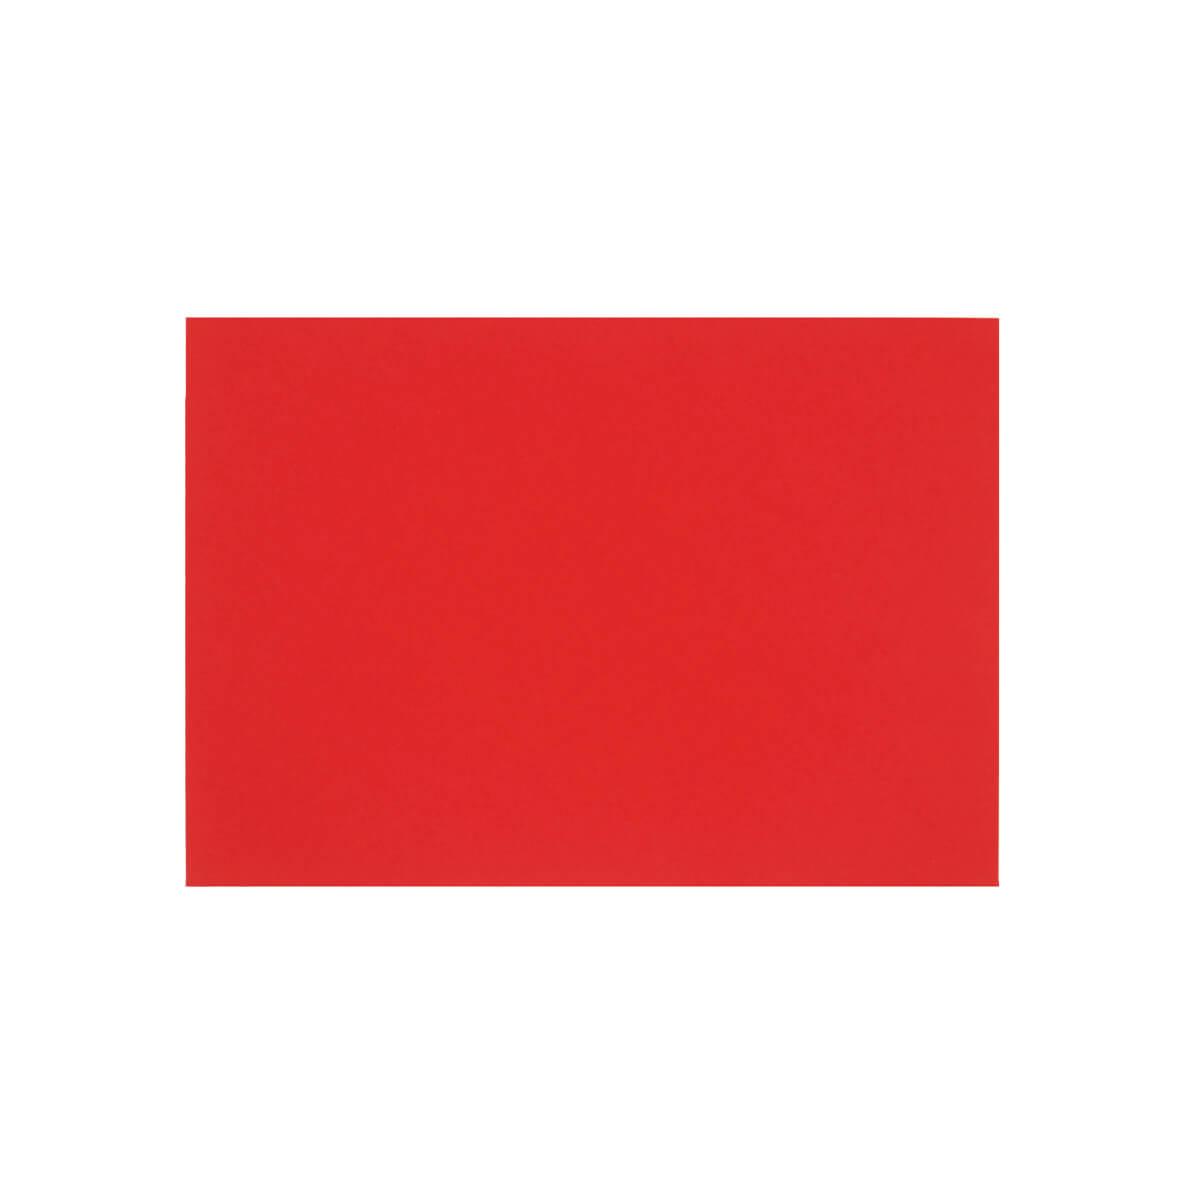 BRIGHT RED 152 x 216mm ENVELOPES 120GSM